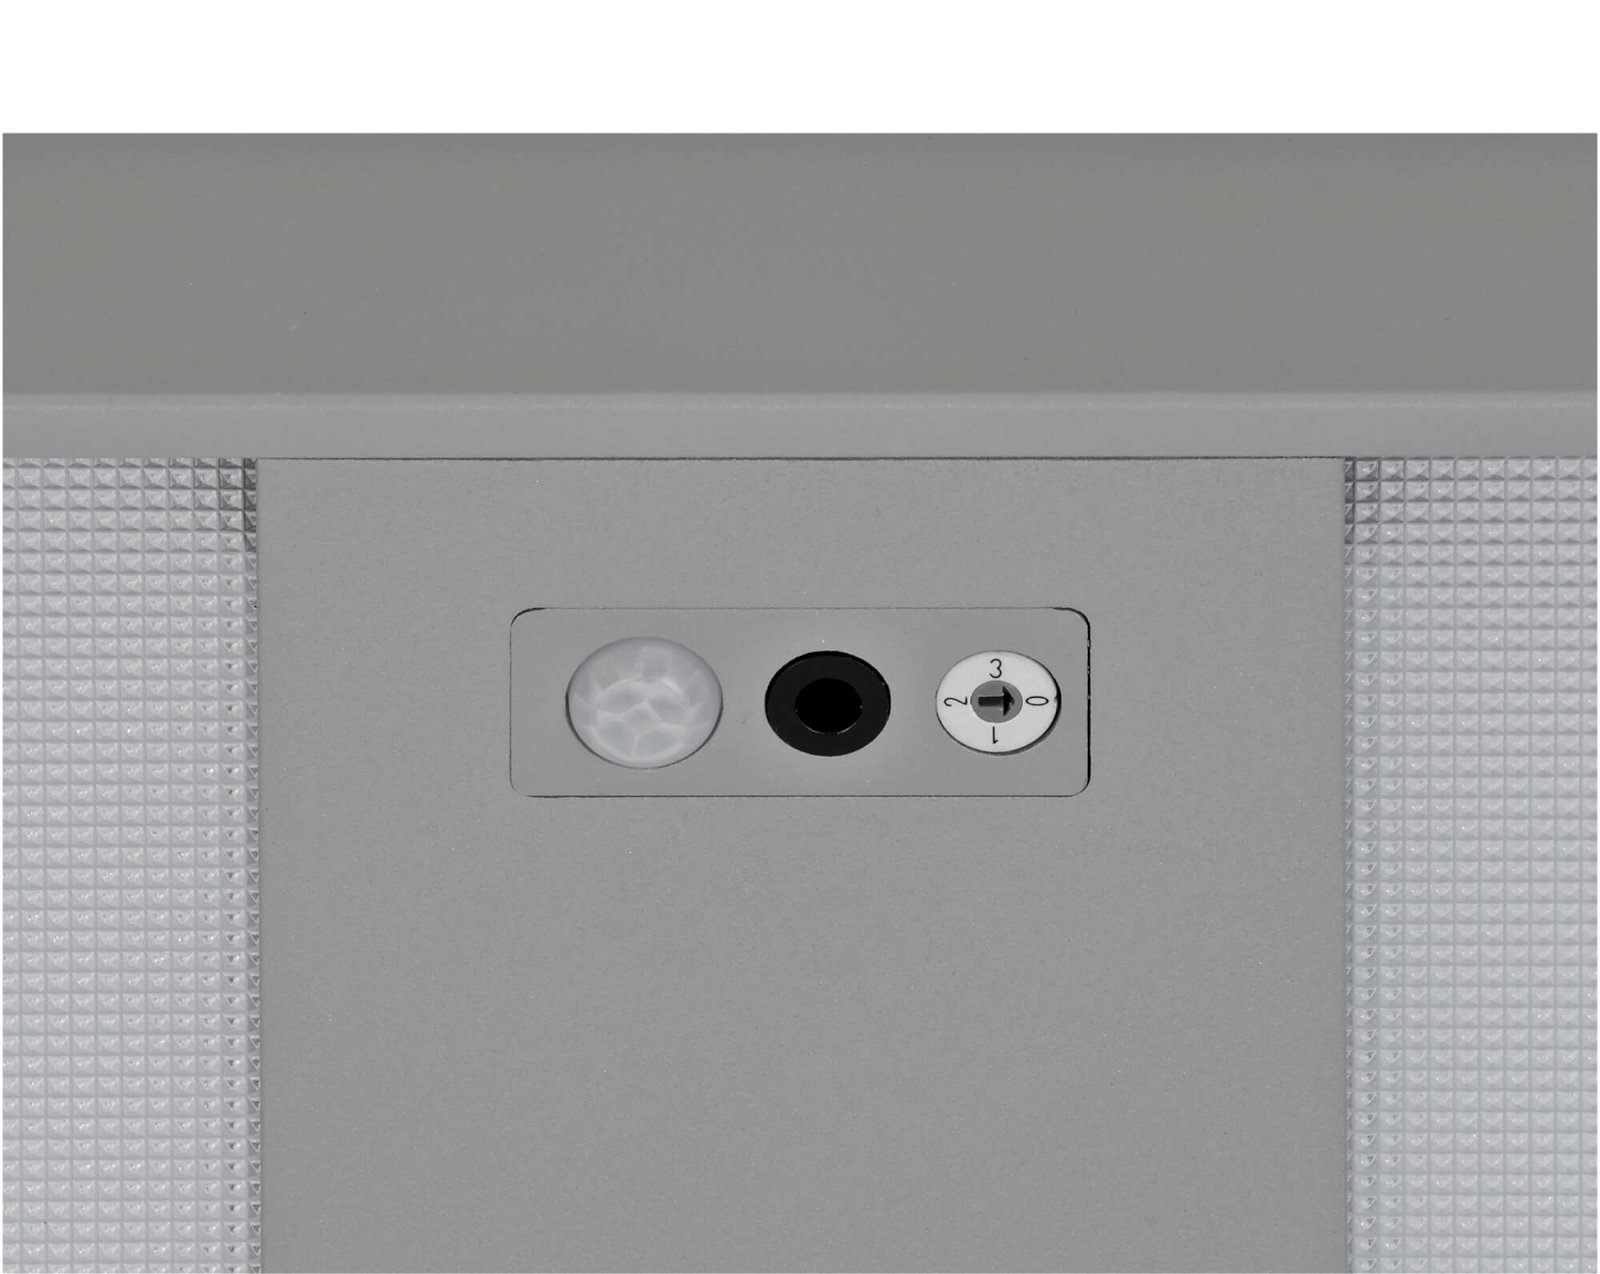 LED-Standleuchte MAULjuvis sensor, dimmbar